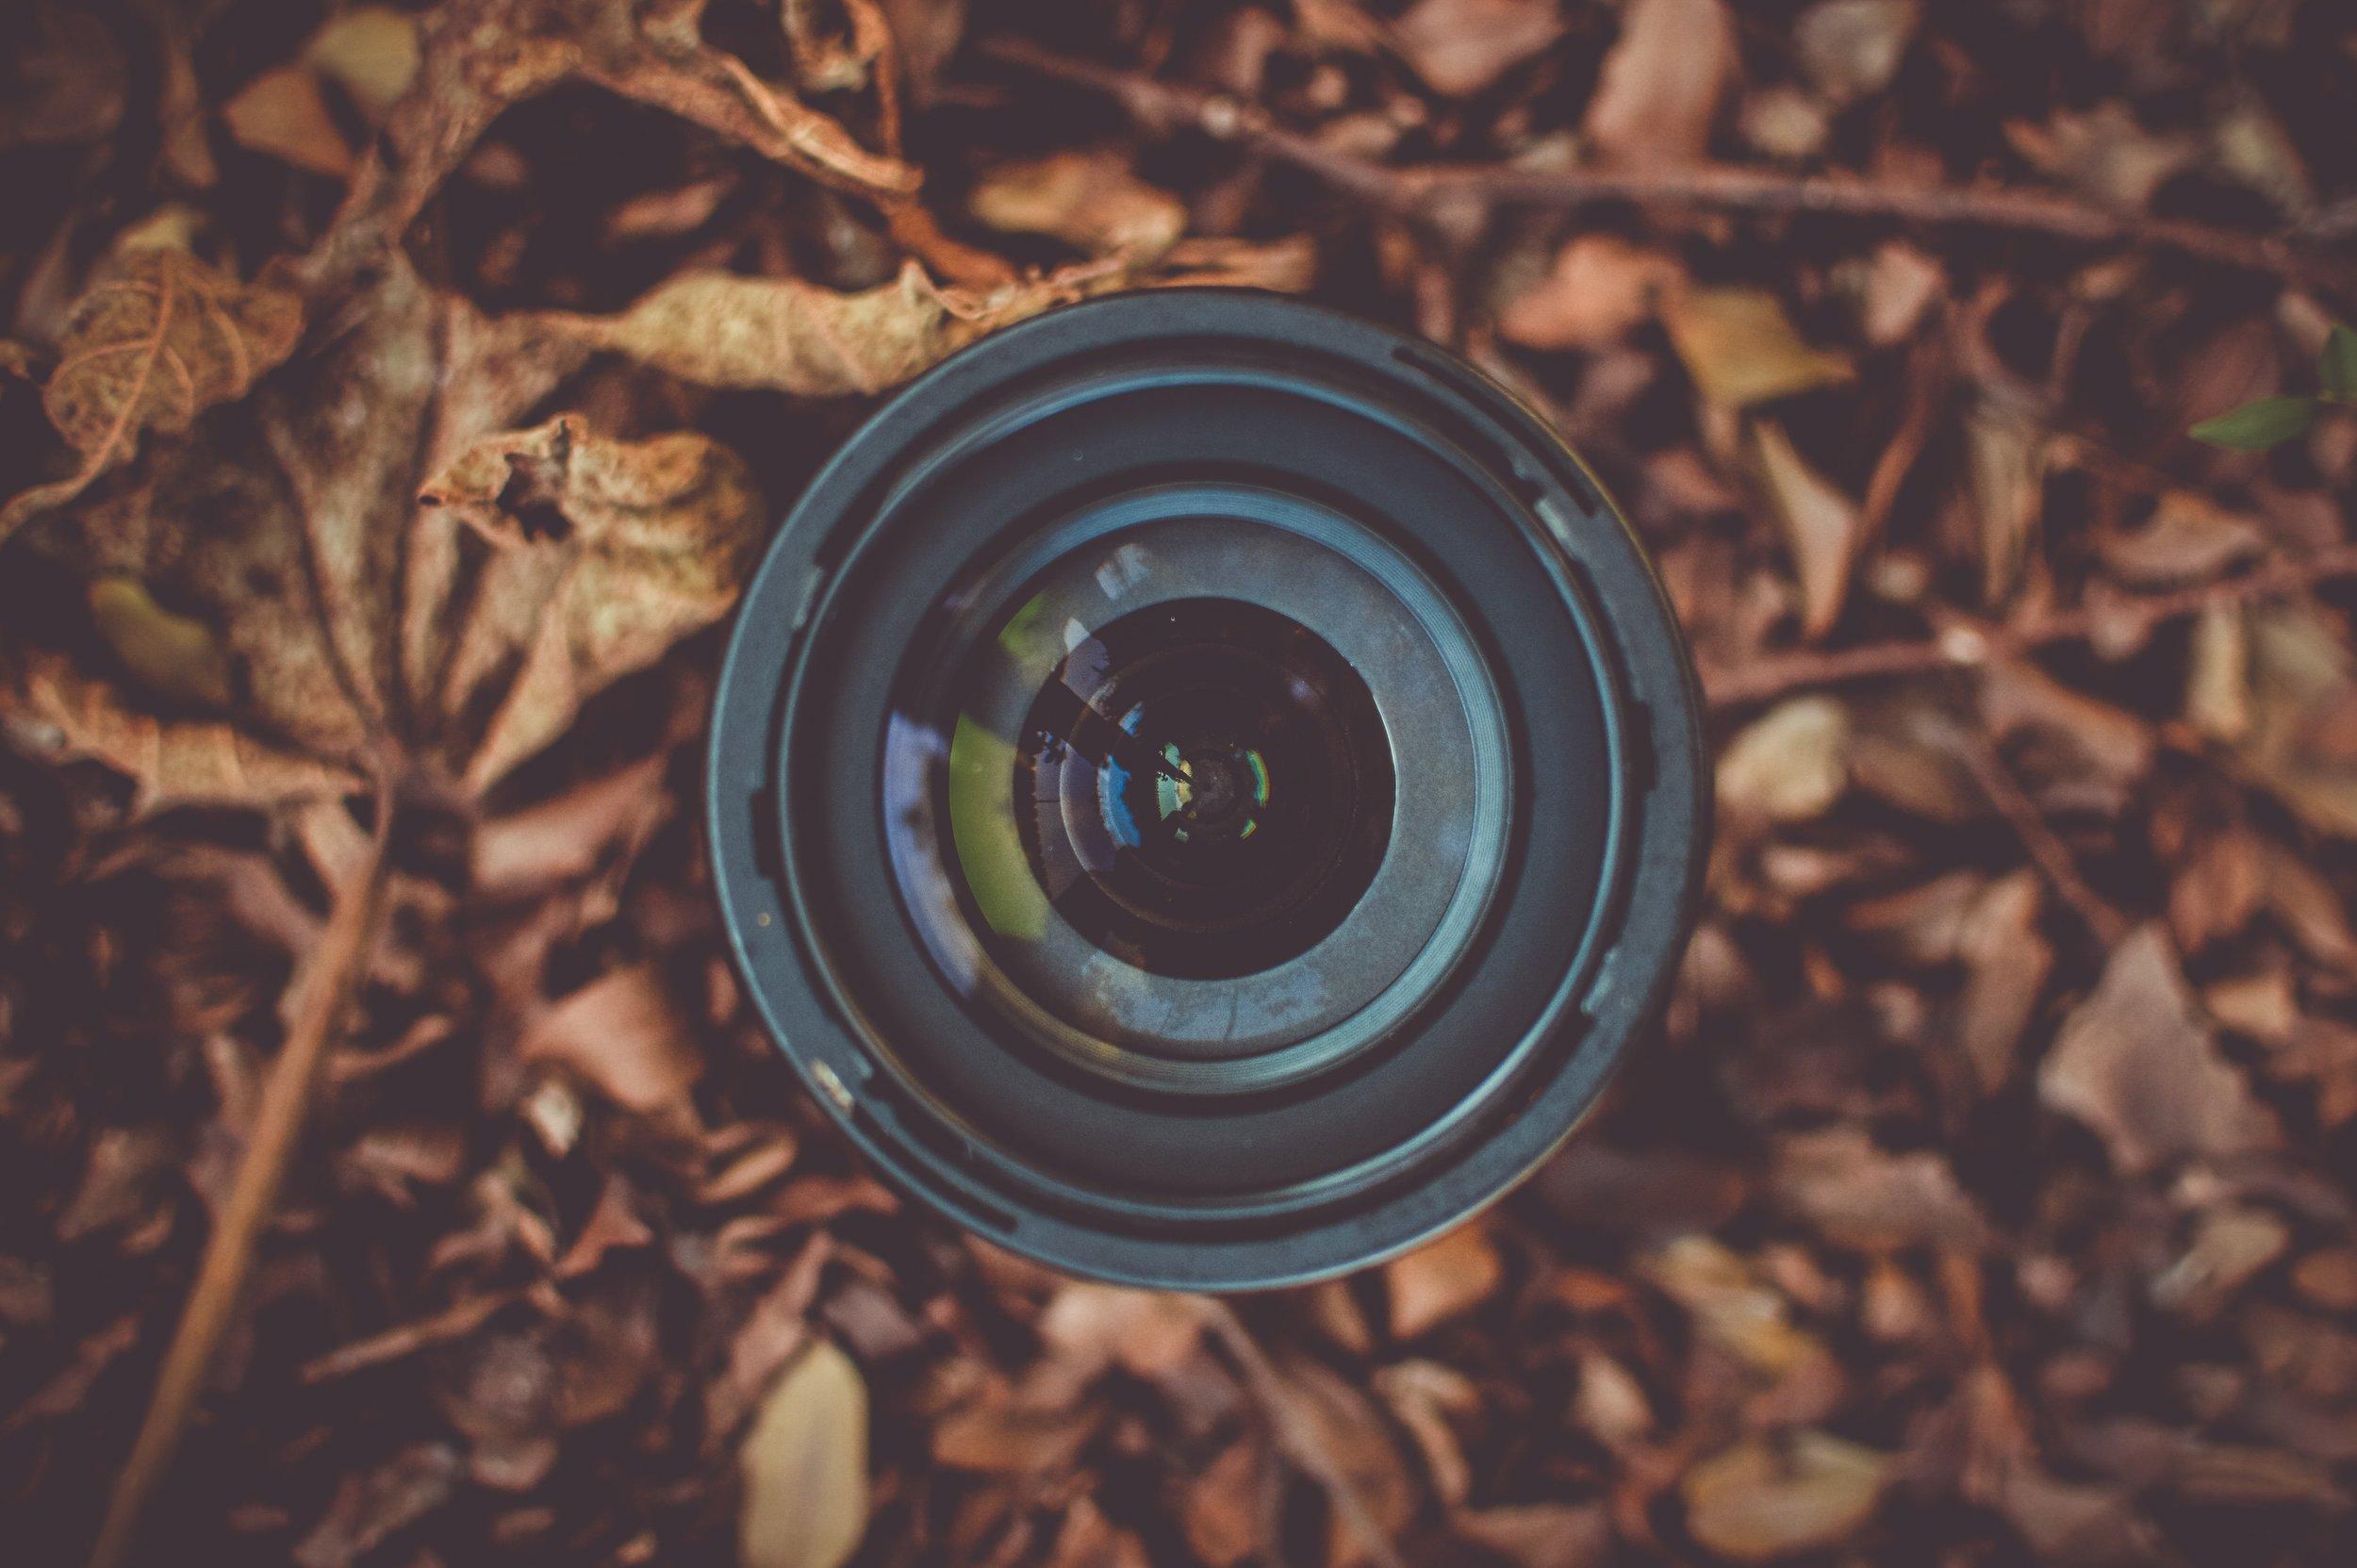 autumn-camera-leaves-69970.jpg